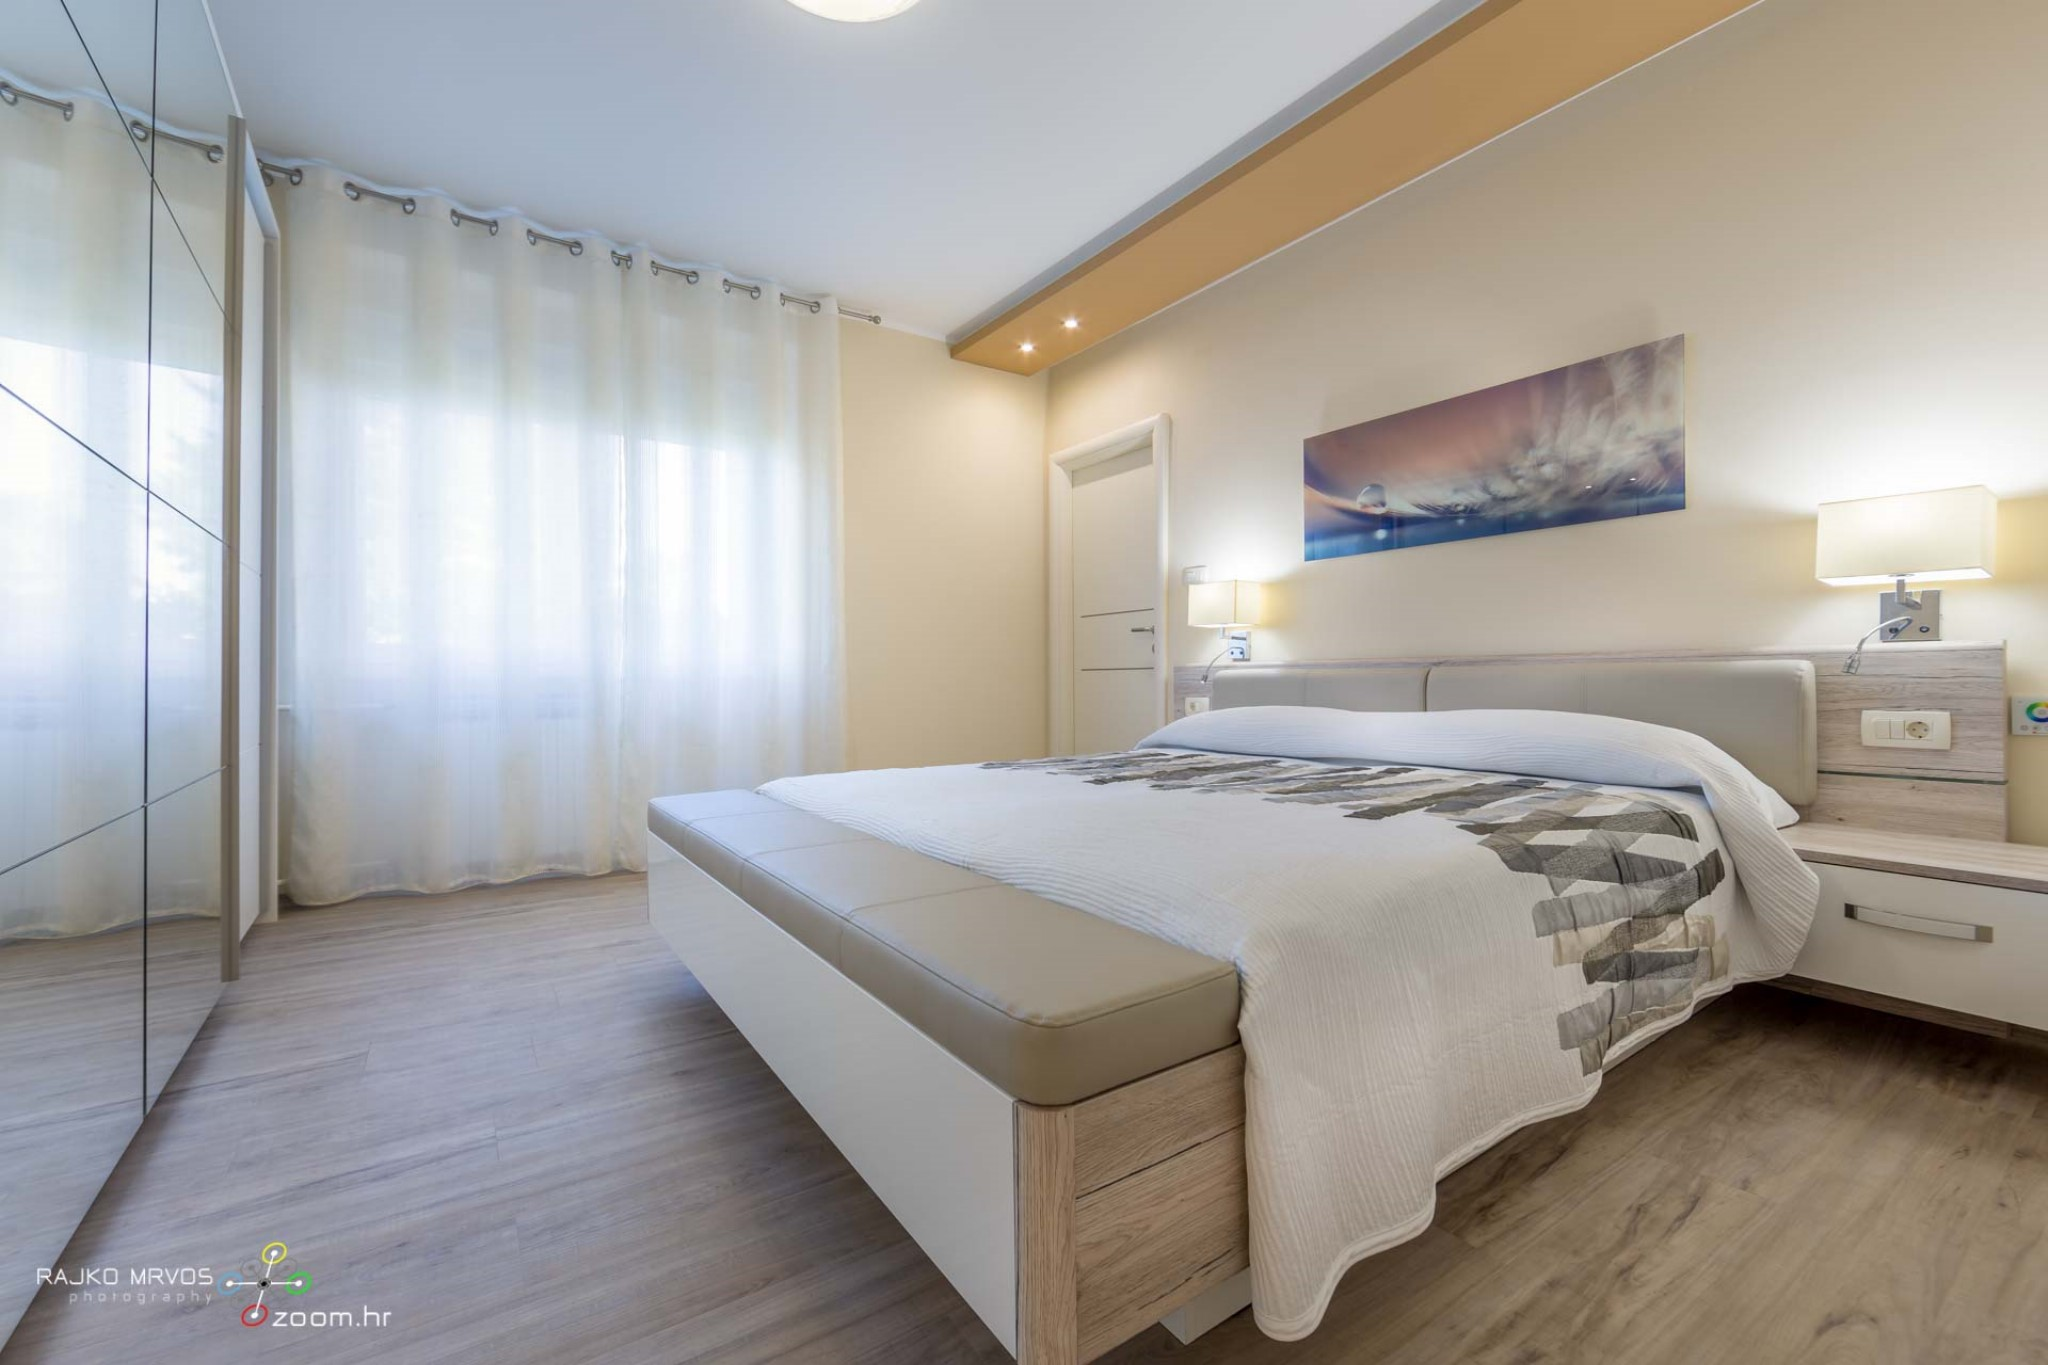 fotografiranje-interijera-fotograf-eksterijera-vila-apartmana-kuca-apartmani-Dujmic-5